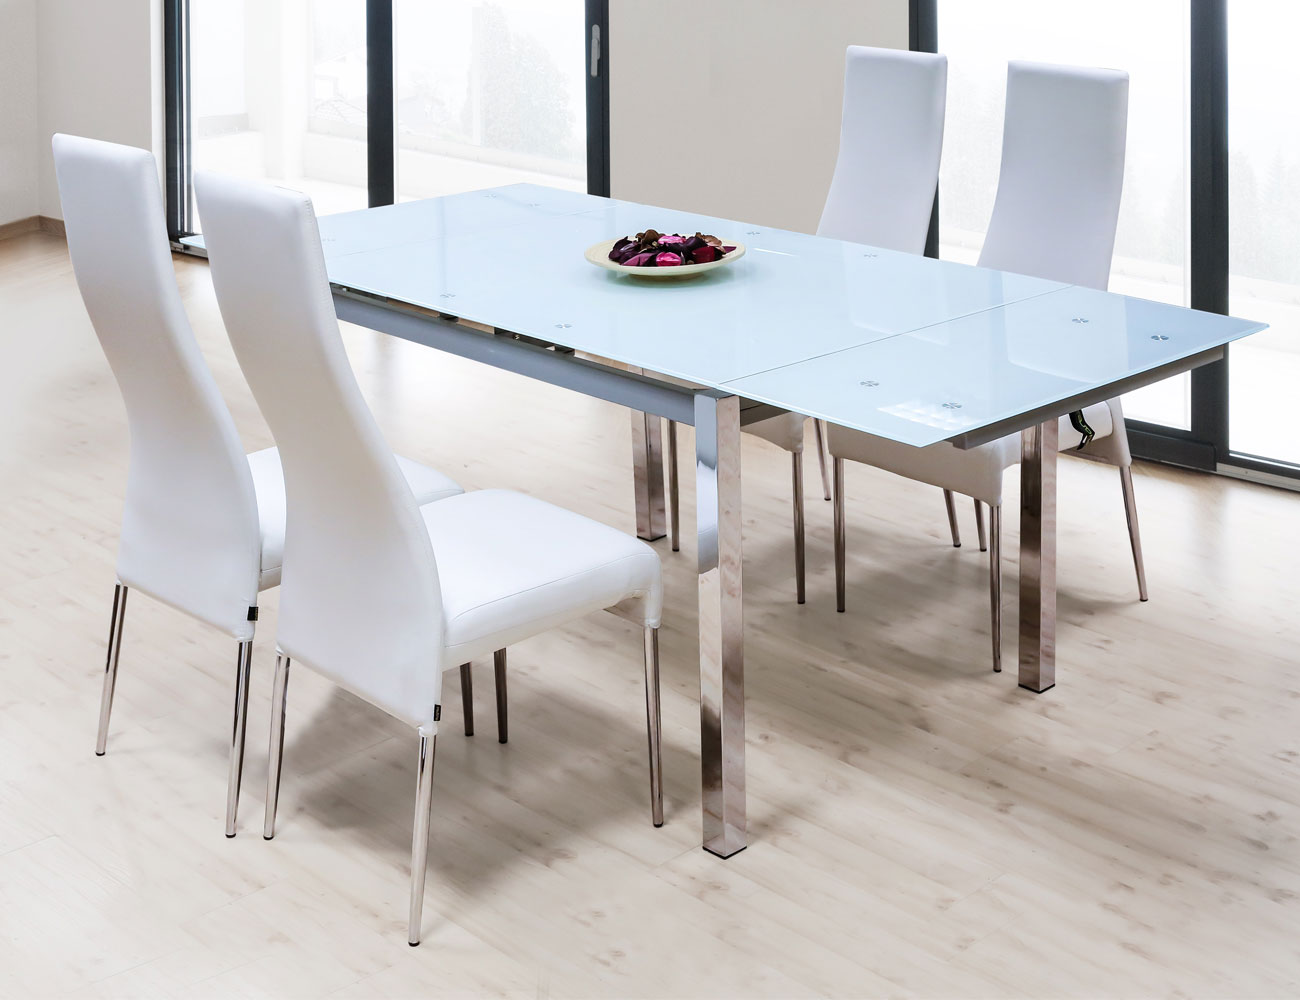 Mesa de comedor de cristal templado extensible con alas for Comedor de cristal